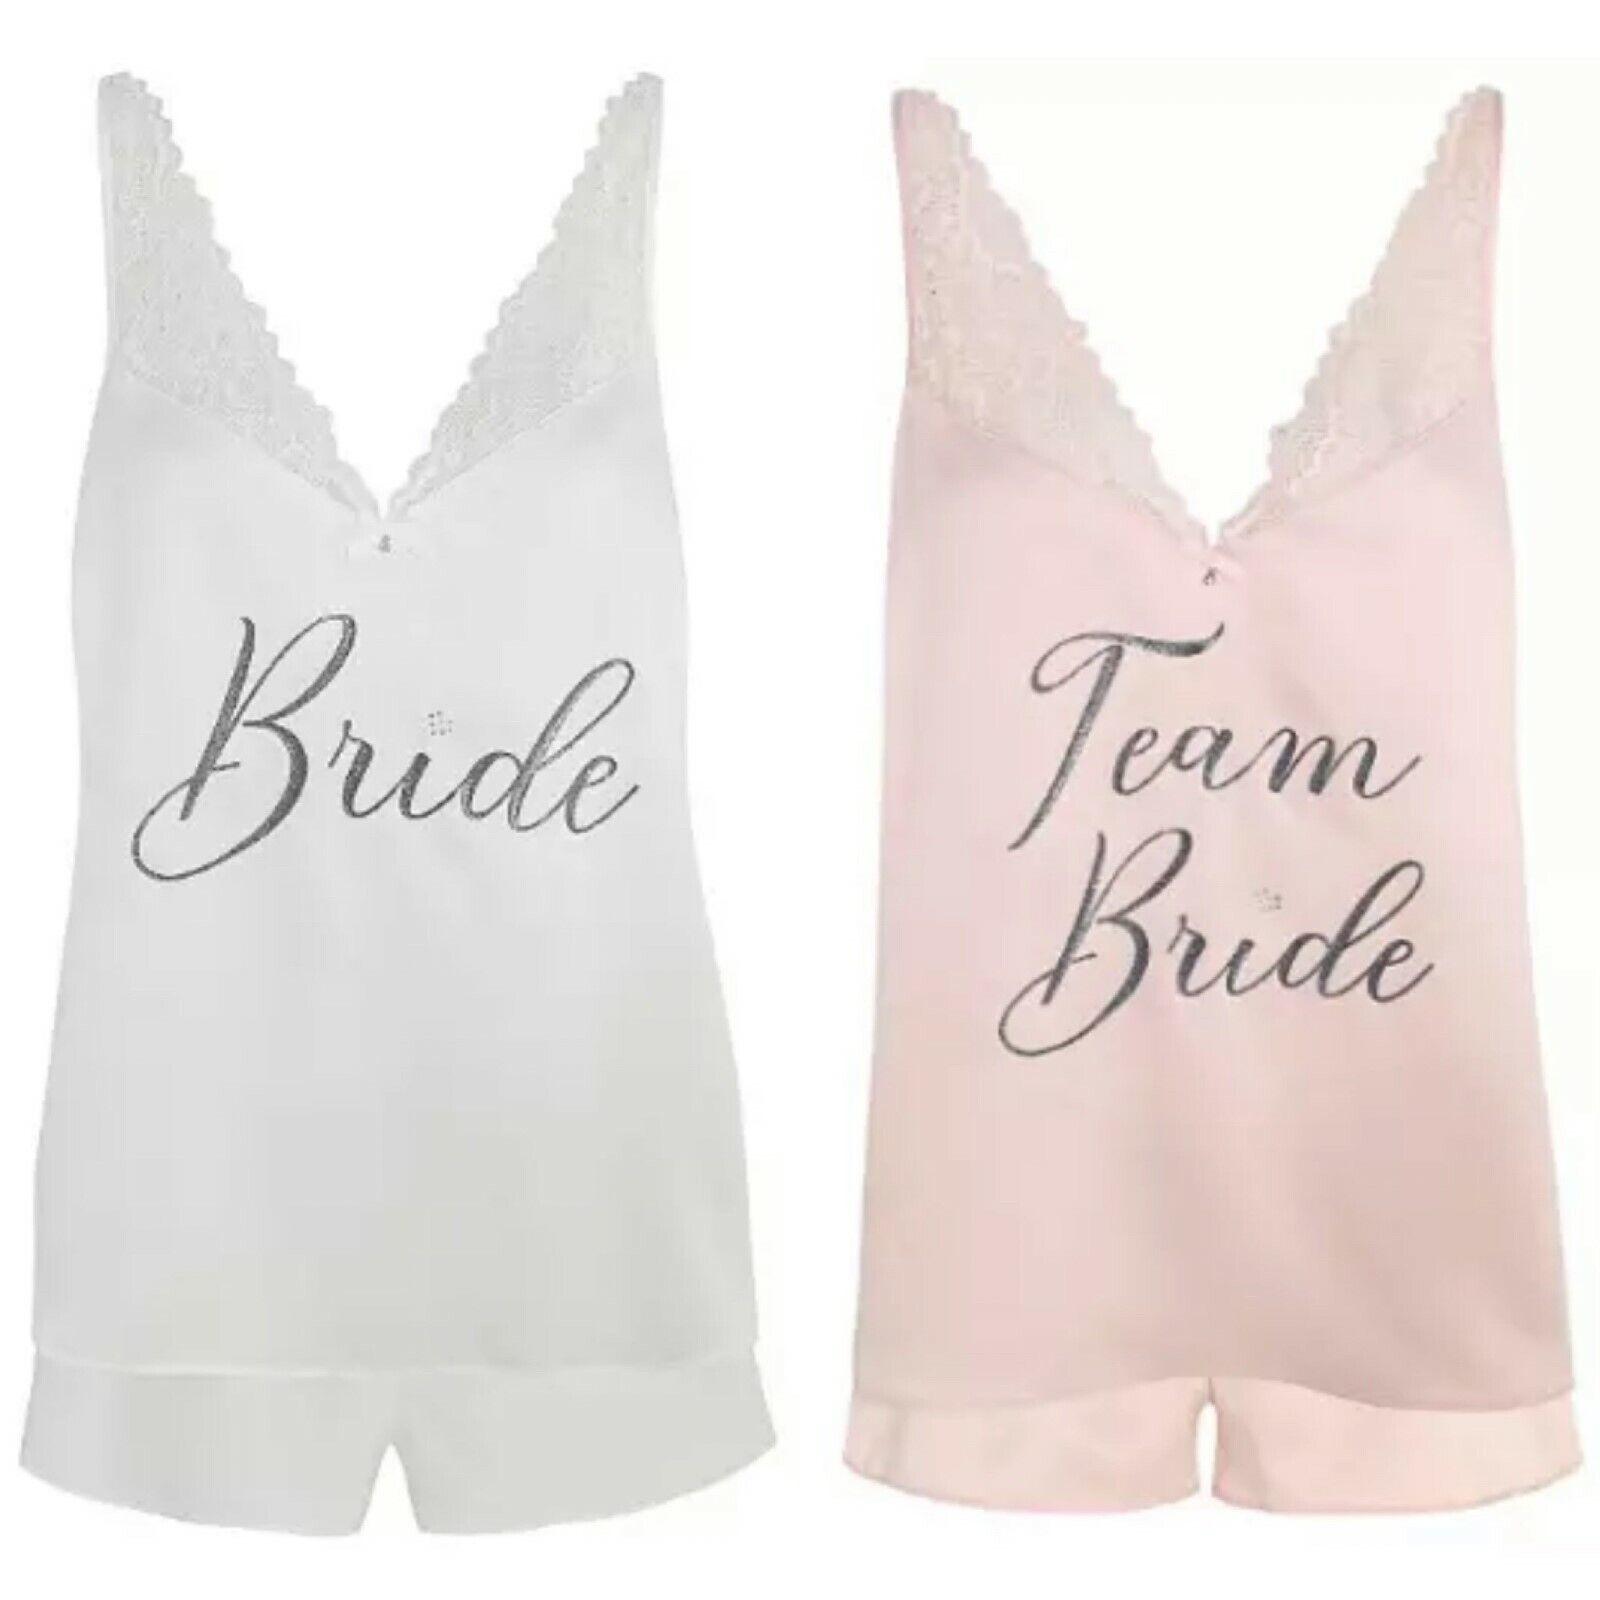 WEDDING PYJAMA SET Bride / Team Bride Hen Party George Shorts Top Lace Glitter